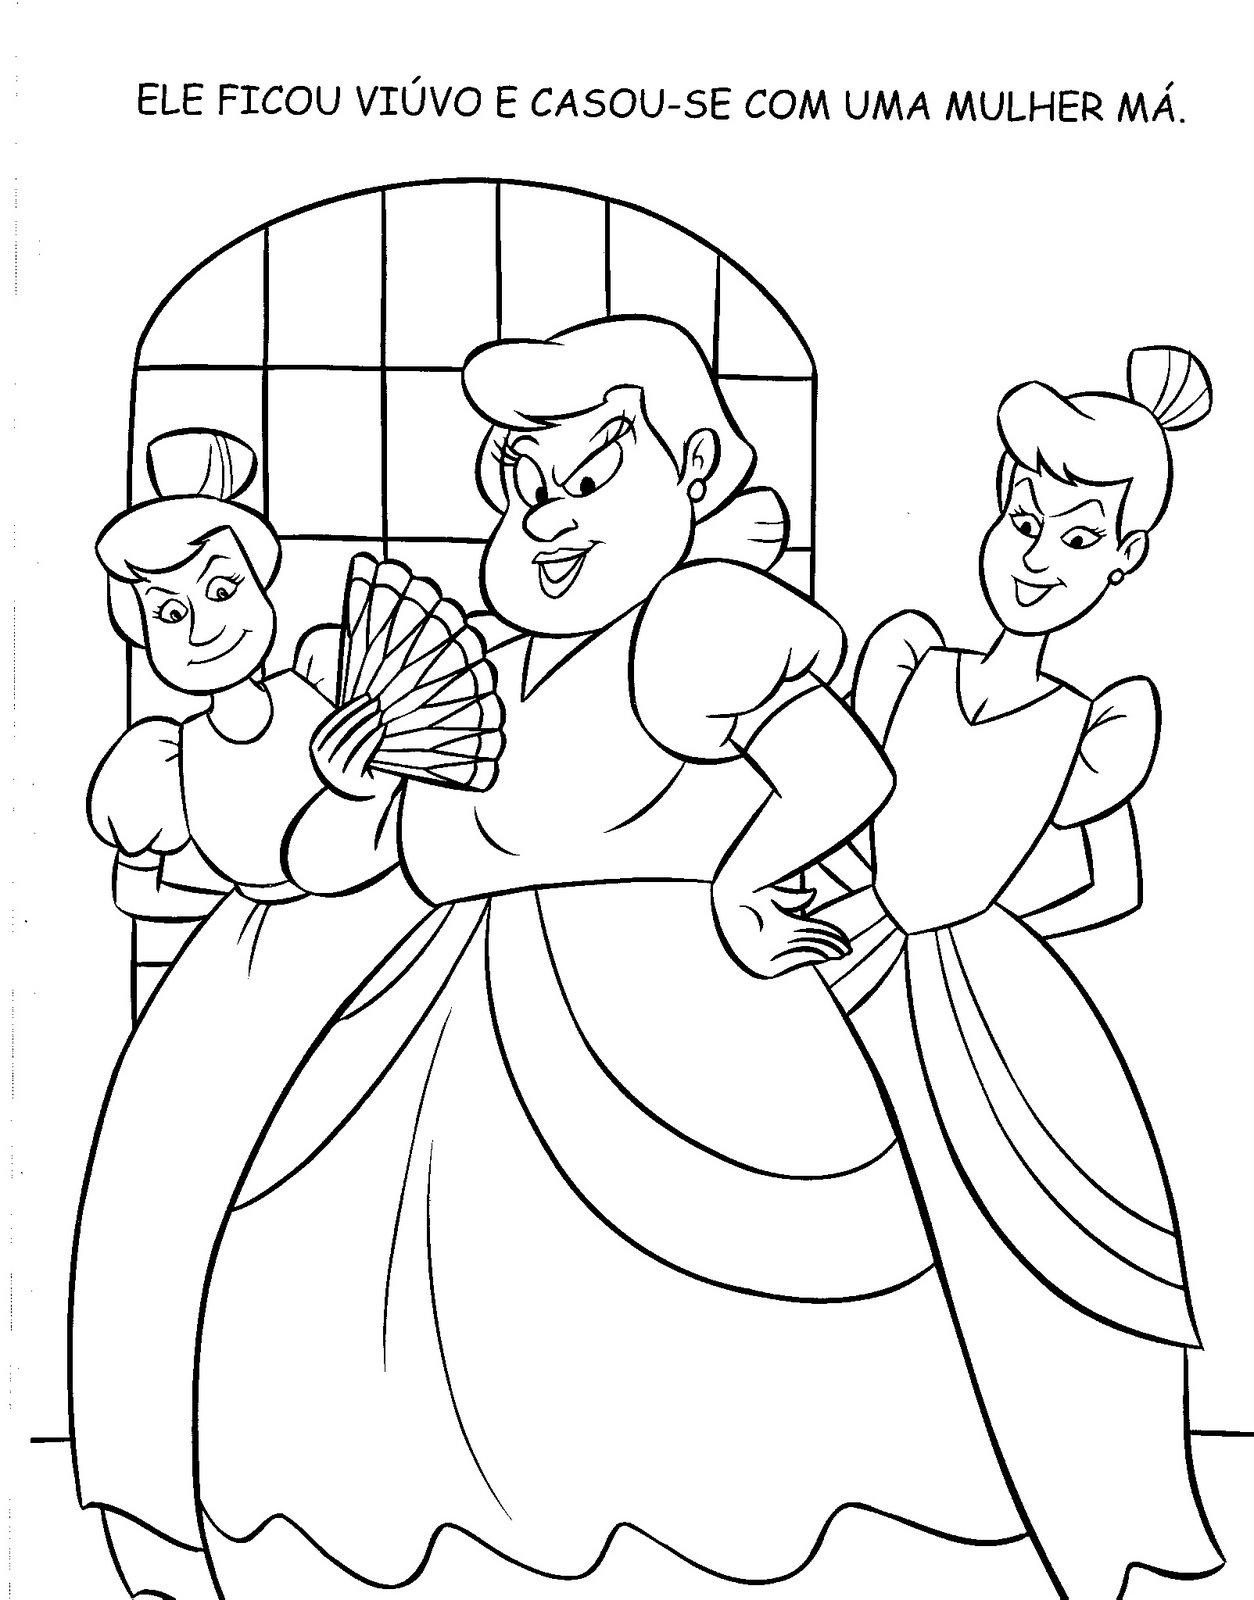 Livro De Historia Cinderela Para Colorir Pintar Imprimir